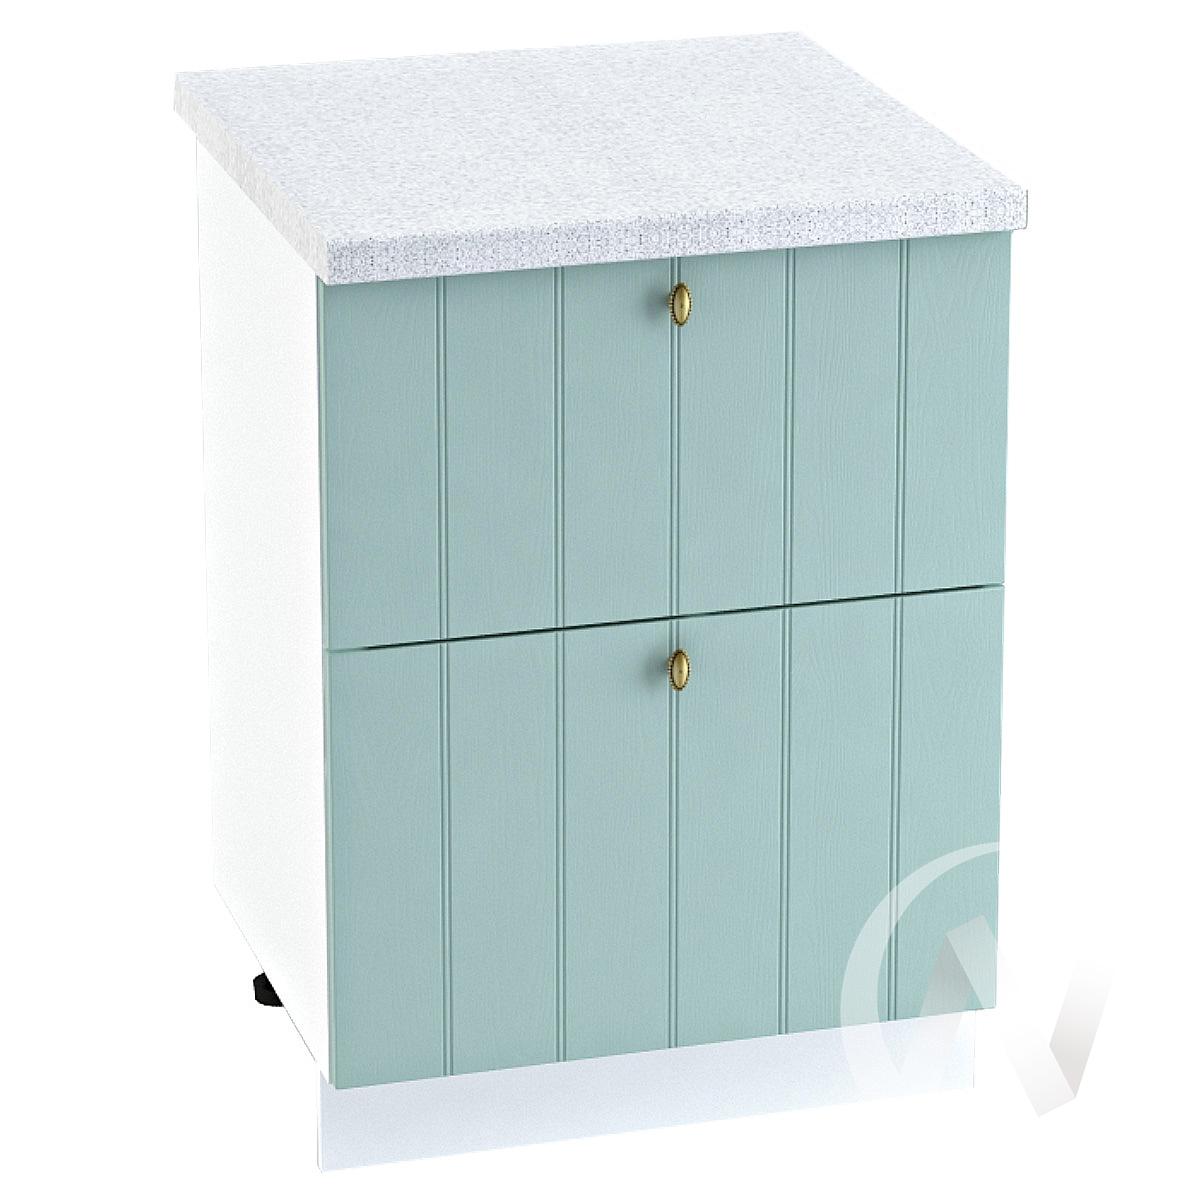 "Кухня ""Прованс"": Шкаф нижний с 2-мя ящиками 600, ШН2Я 600 (голубой/корпус белый)"